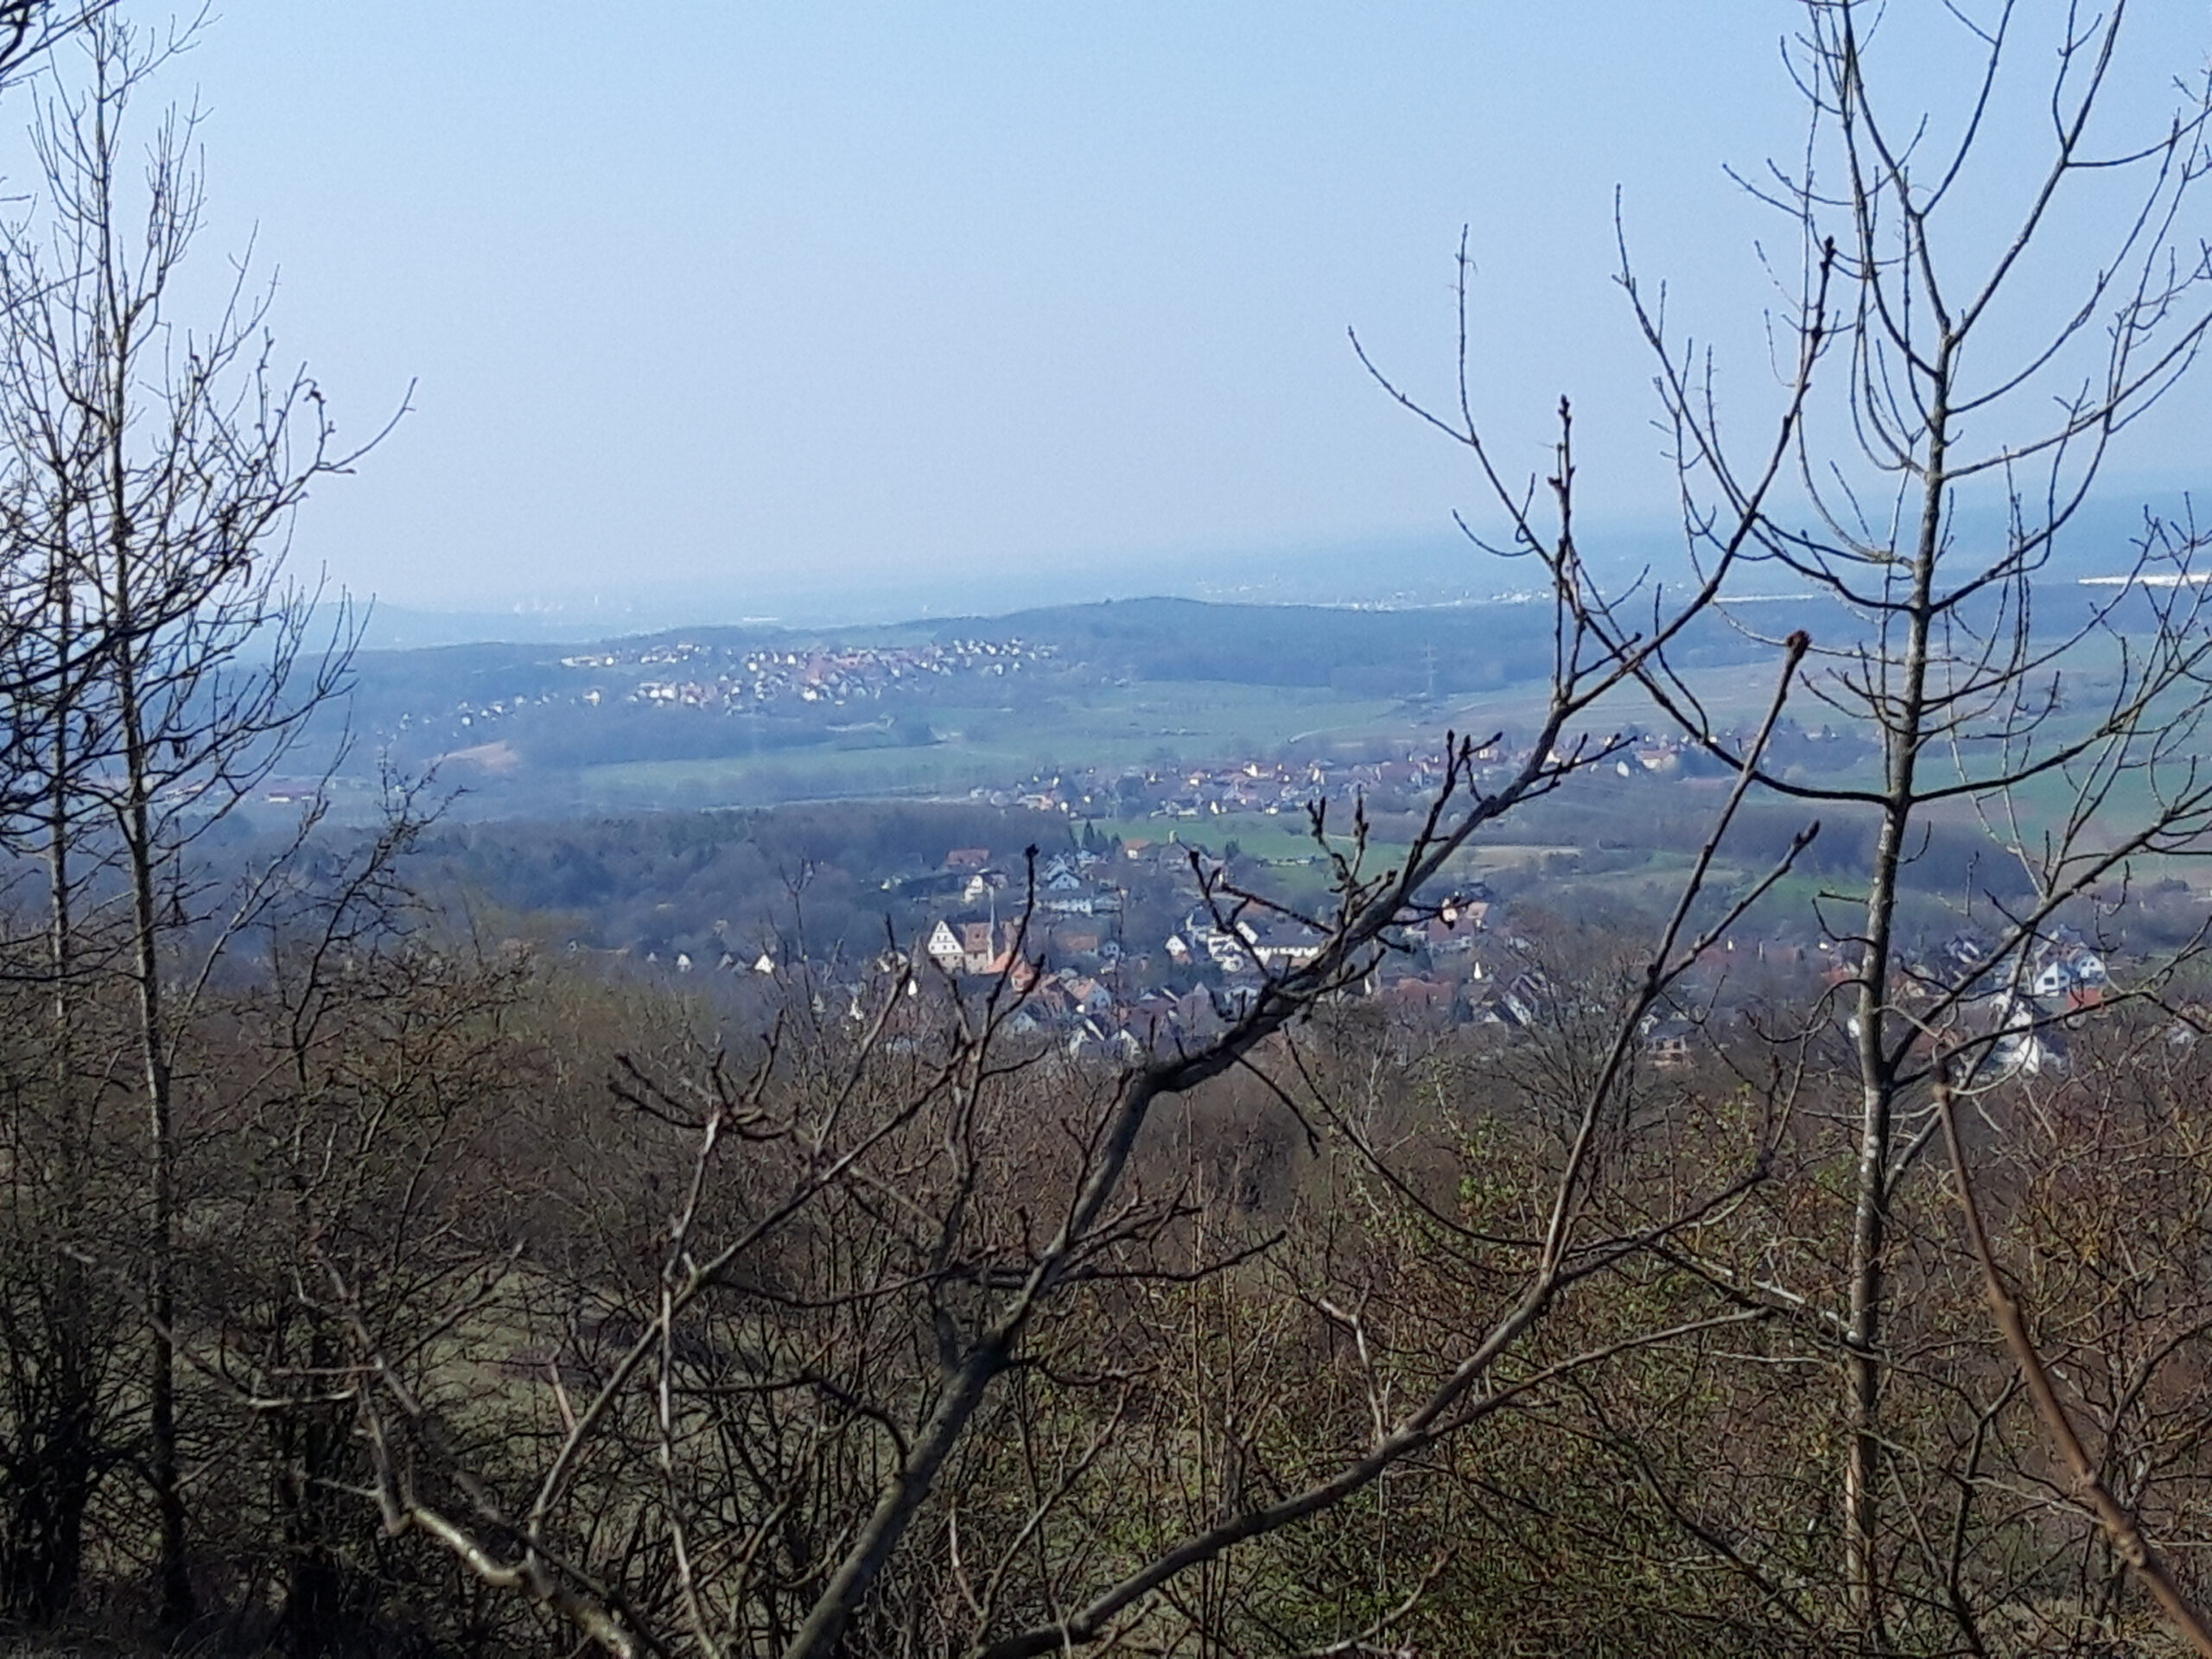 Walberla Richtung Erlangen